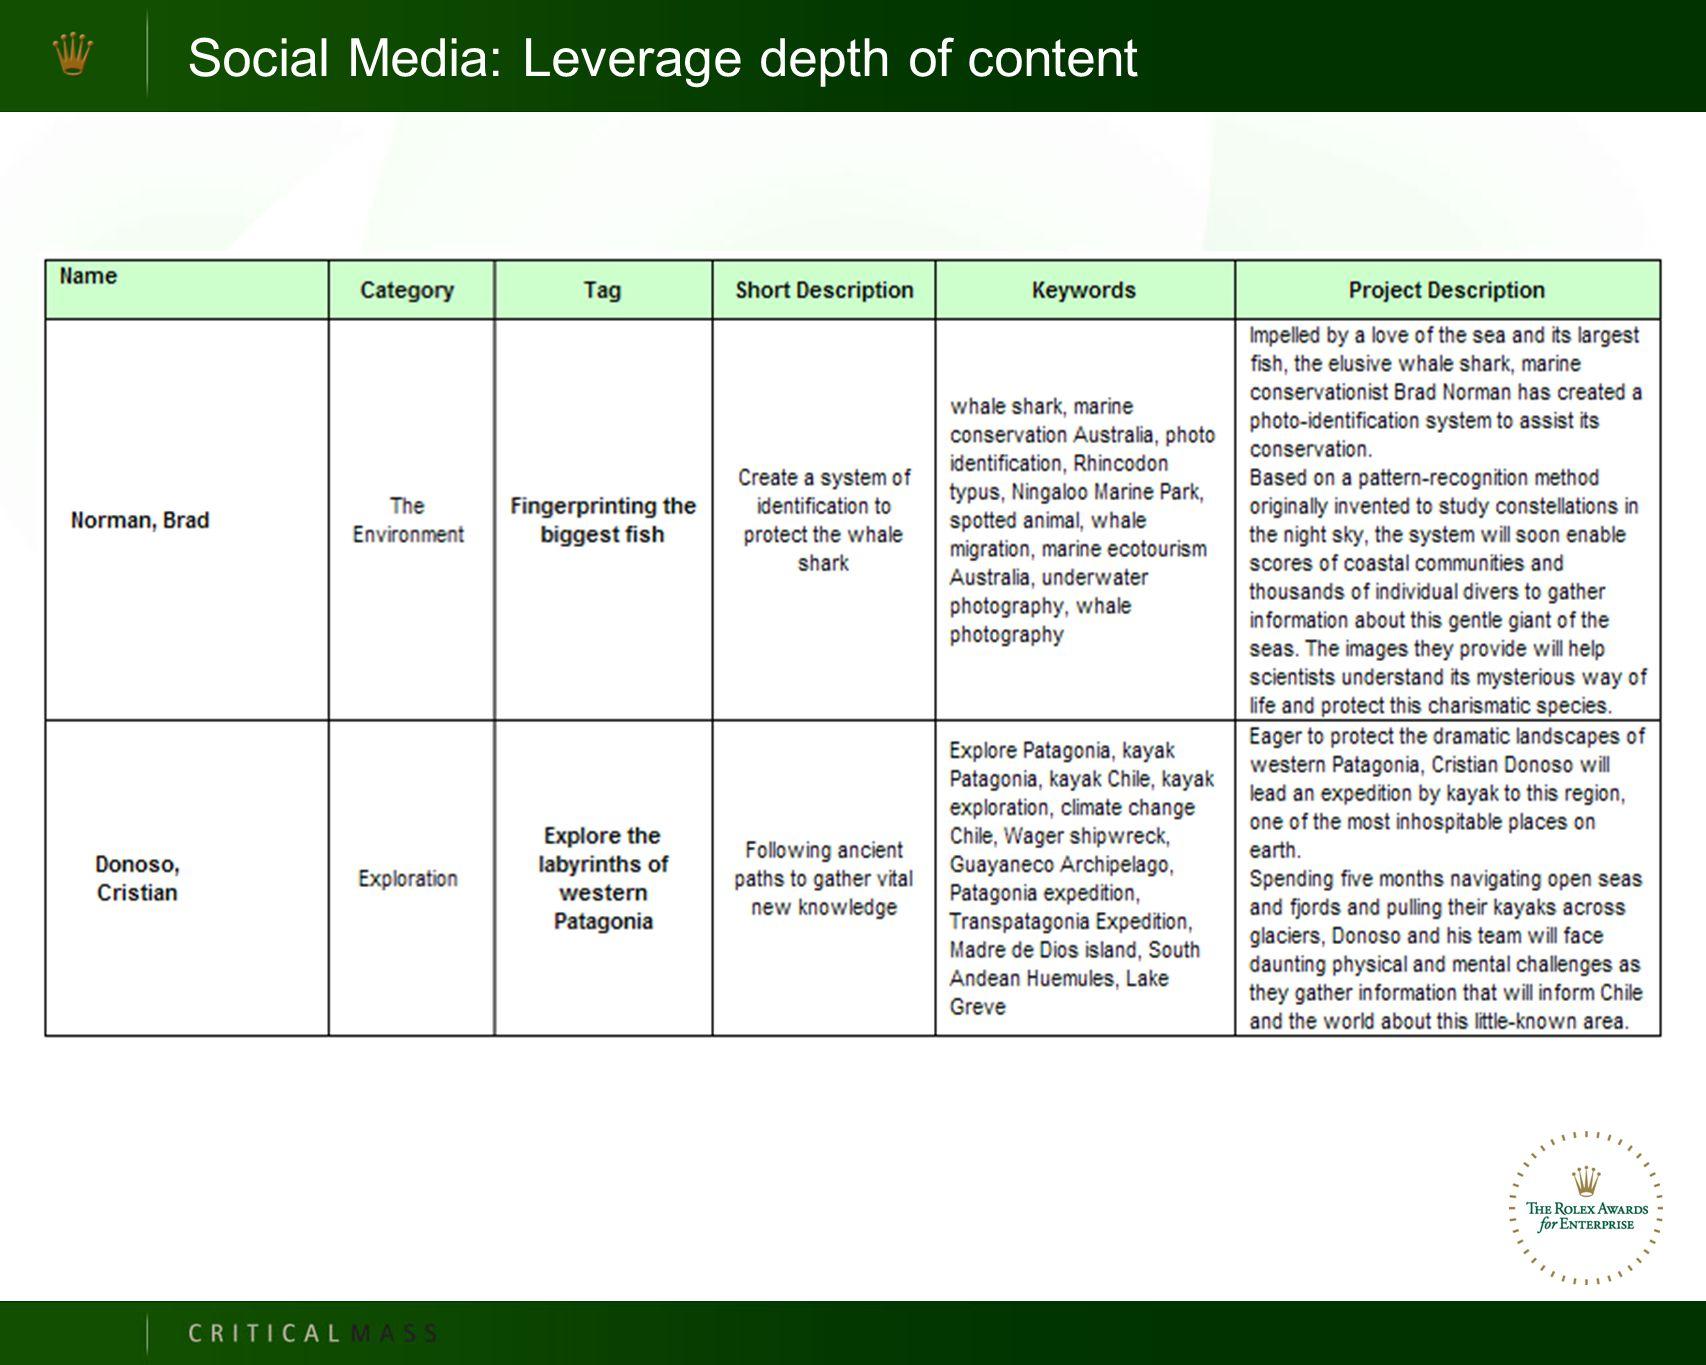 Social Media: Leverage depth of content